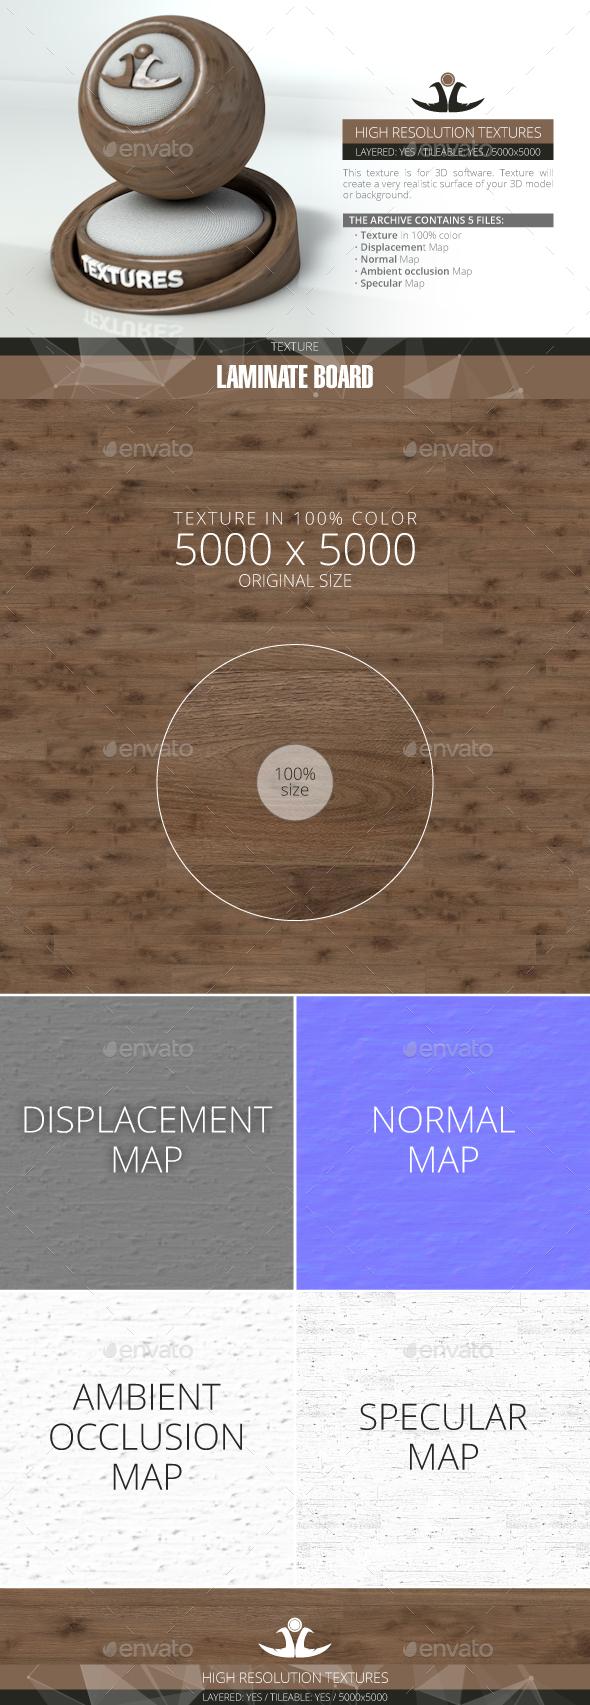 Laminate Board 65 - 3DOcean Item for Sale